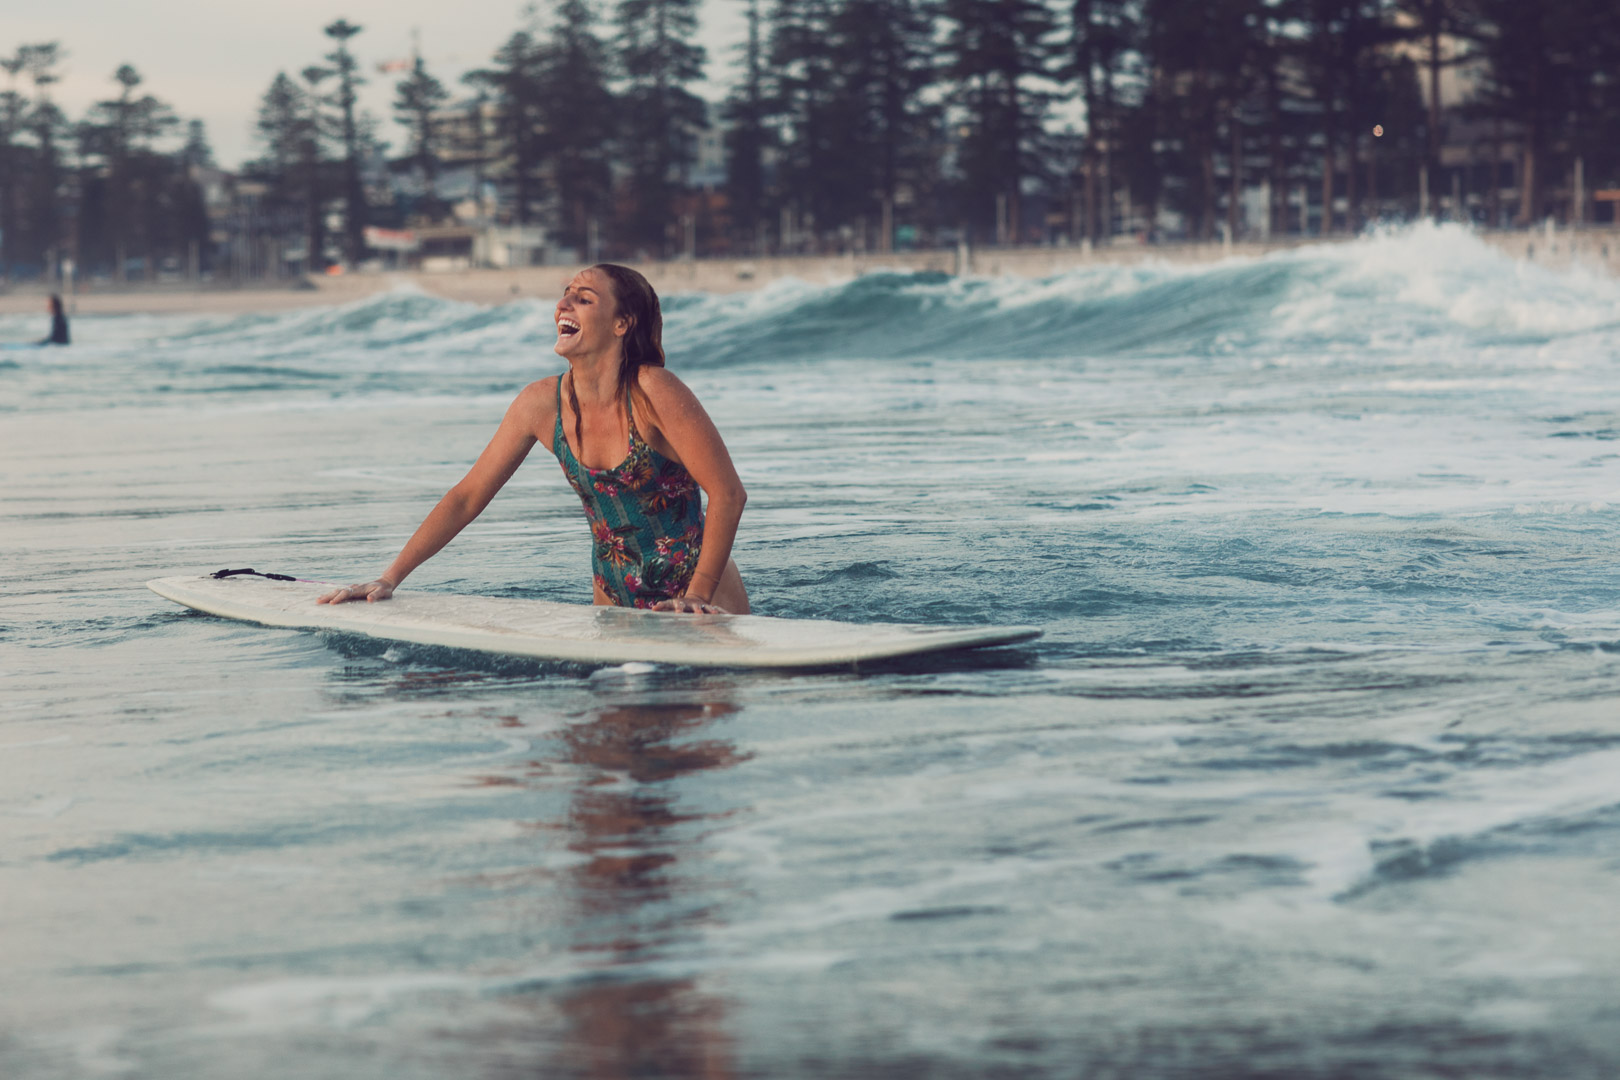 Surfgirl-mxmsurfphoto-Morgan20180508-928-Edit.jpg